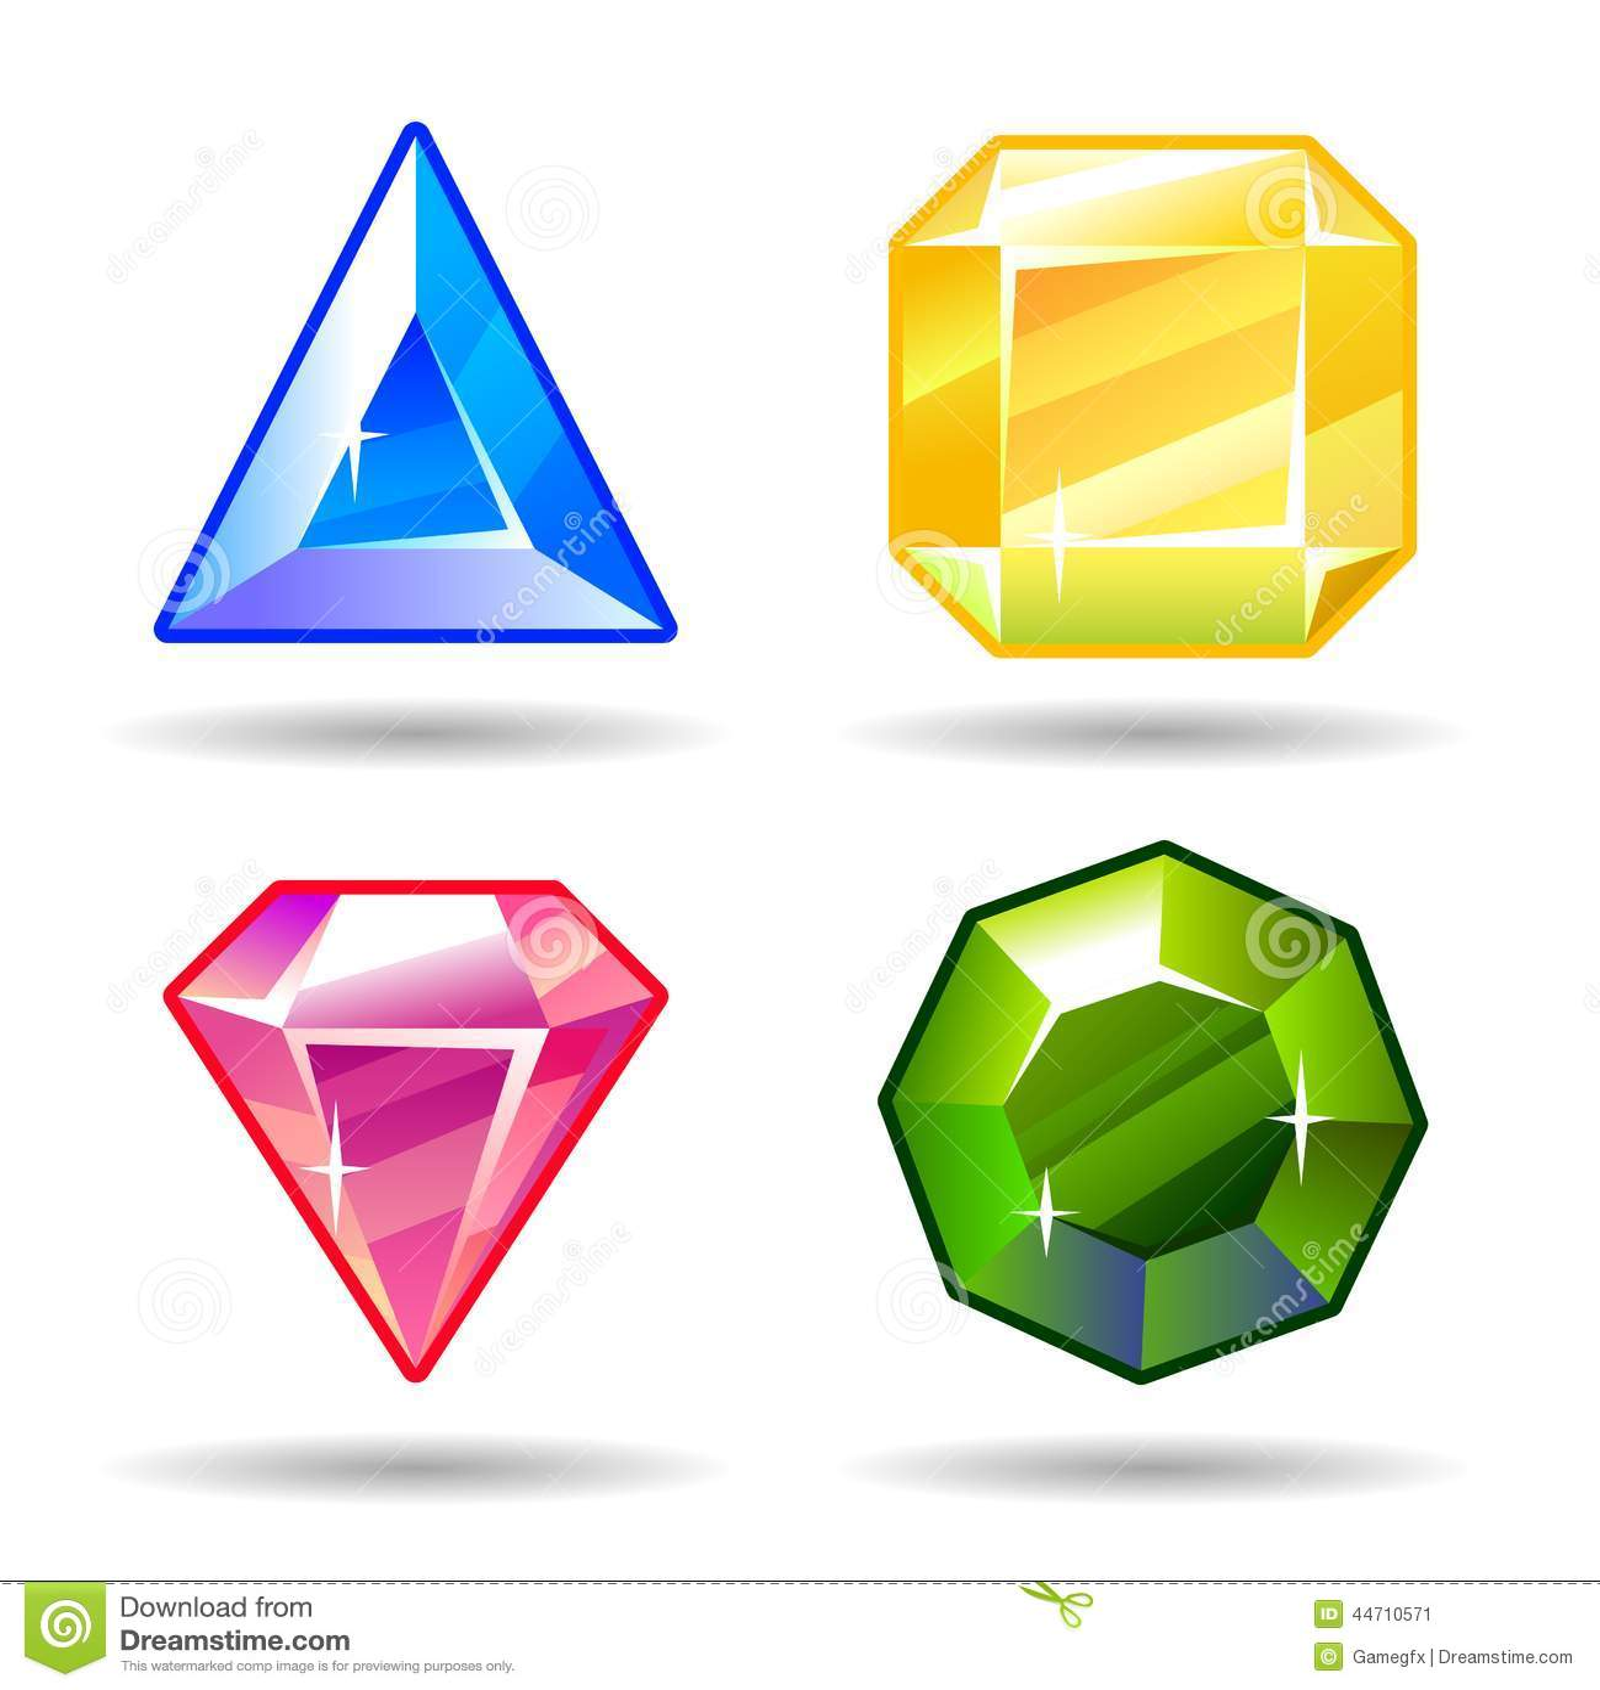 Cartoon Vector Gems And Diamonds Icons Set Stock Vector - Illustration of symbol, shiny: 44710571